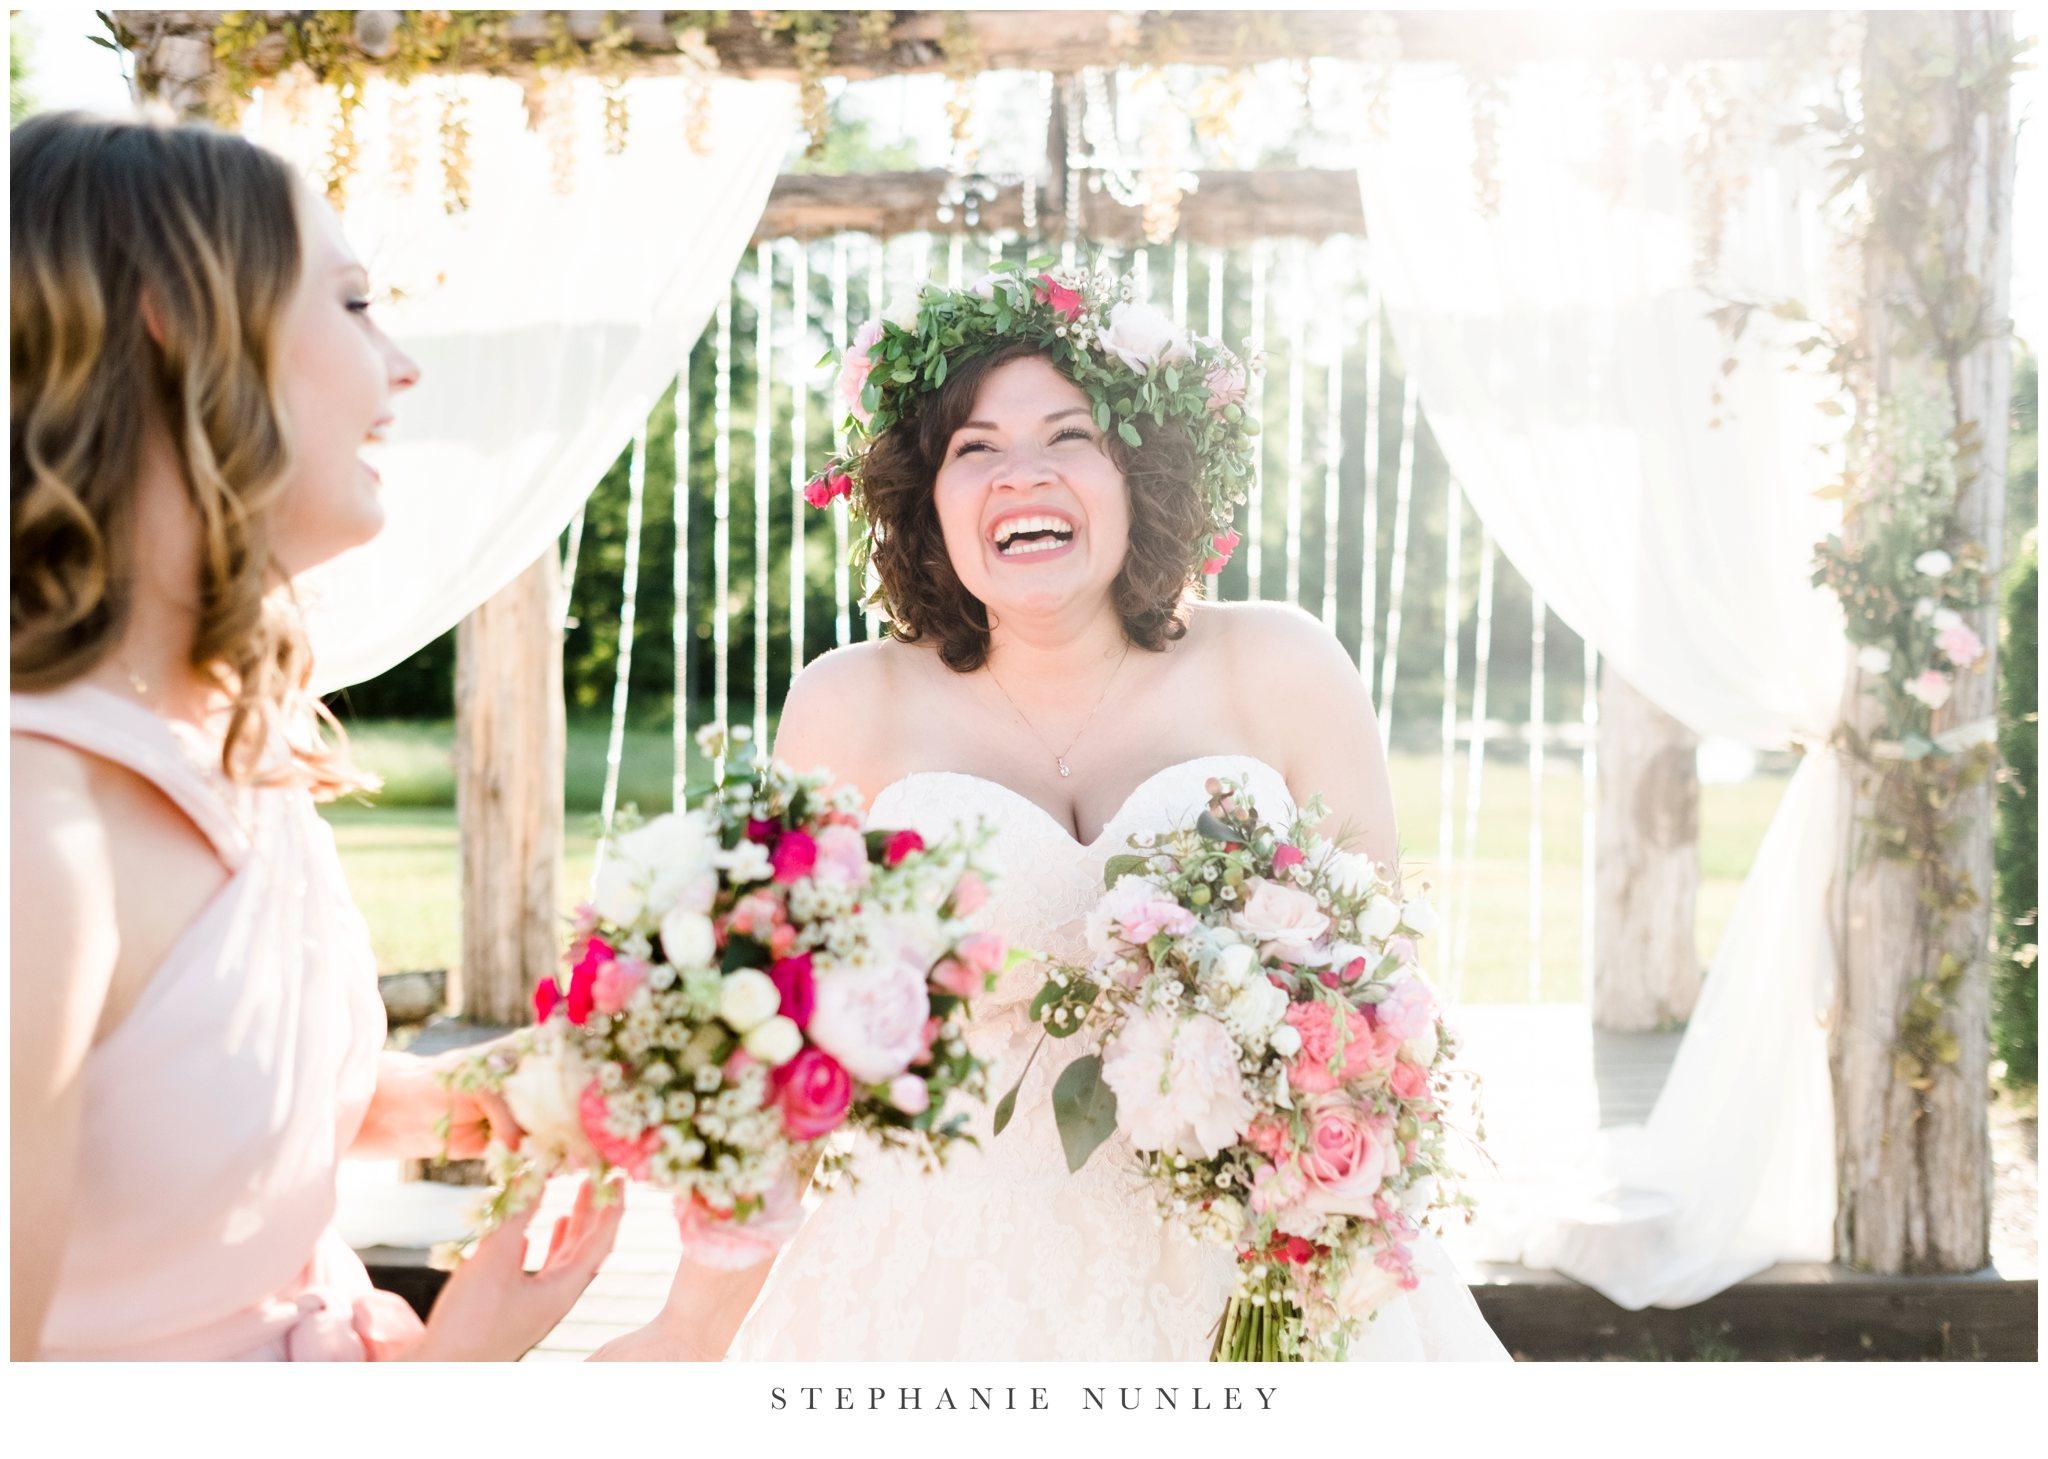 romantic-outdoor-wedding-with-flower-crown-0126.jpg